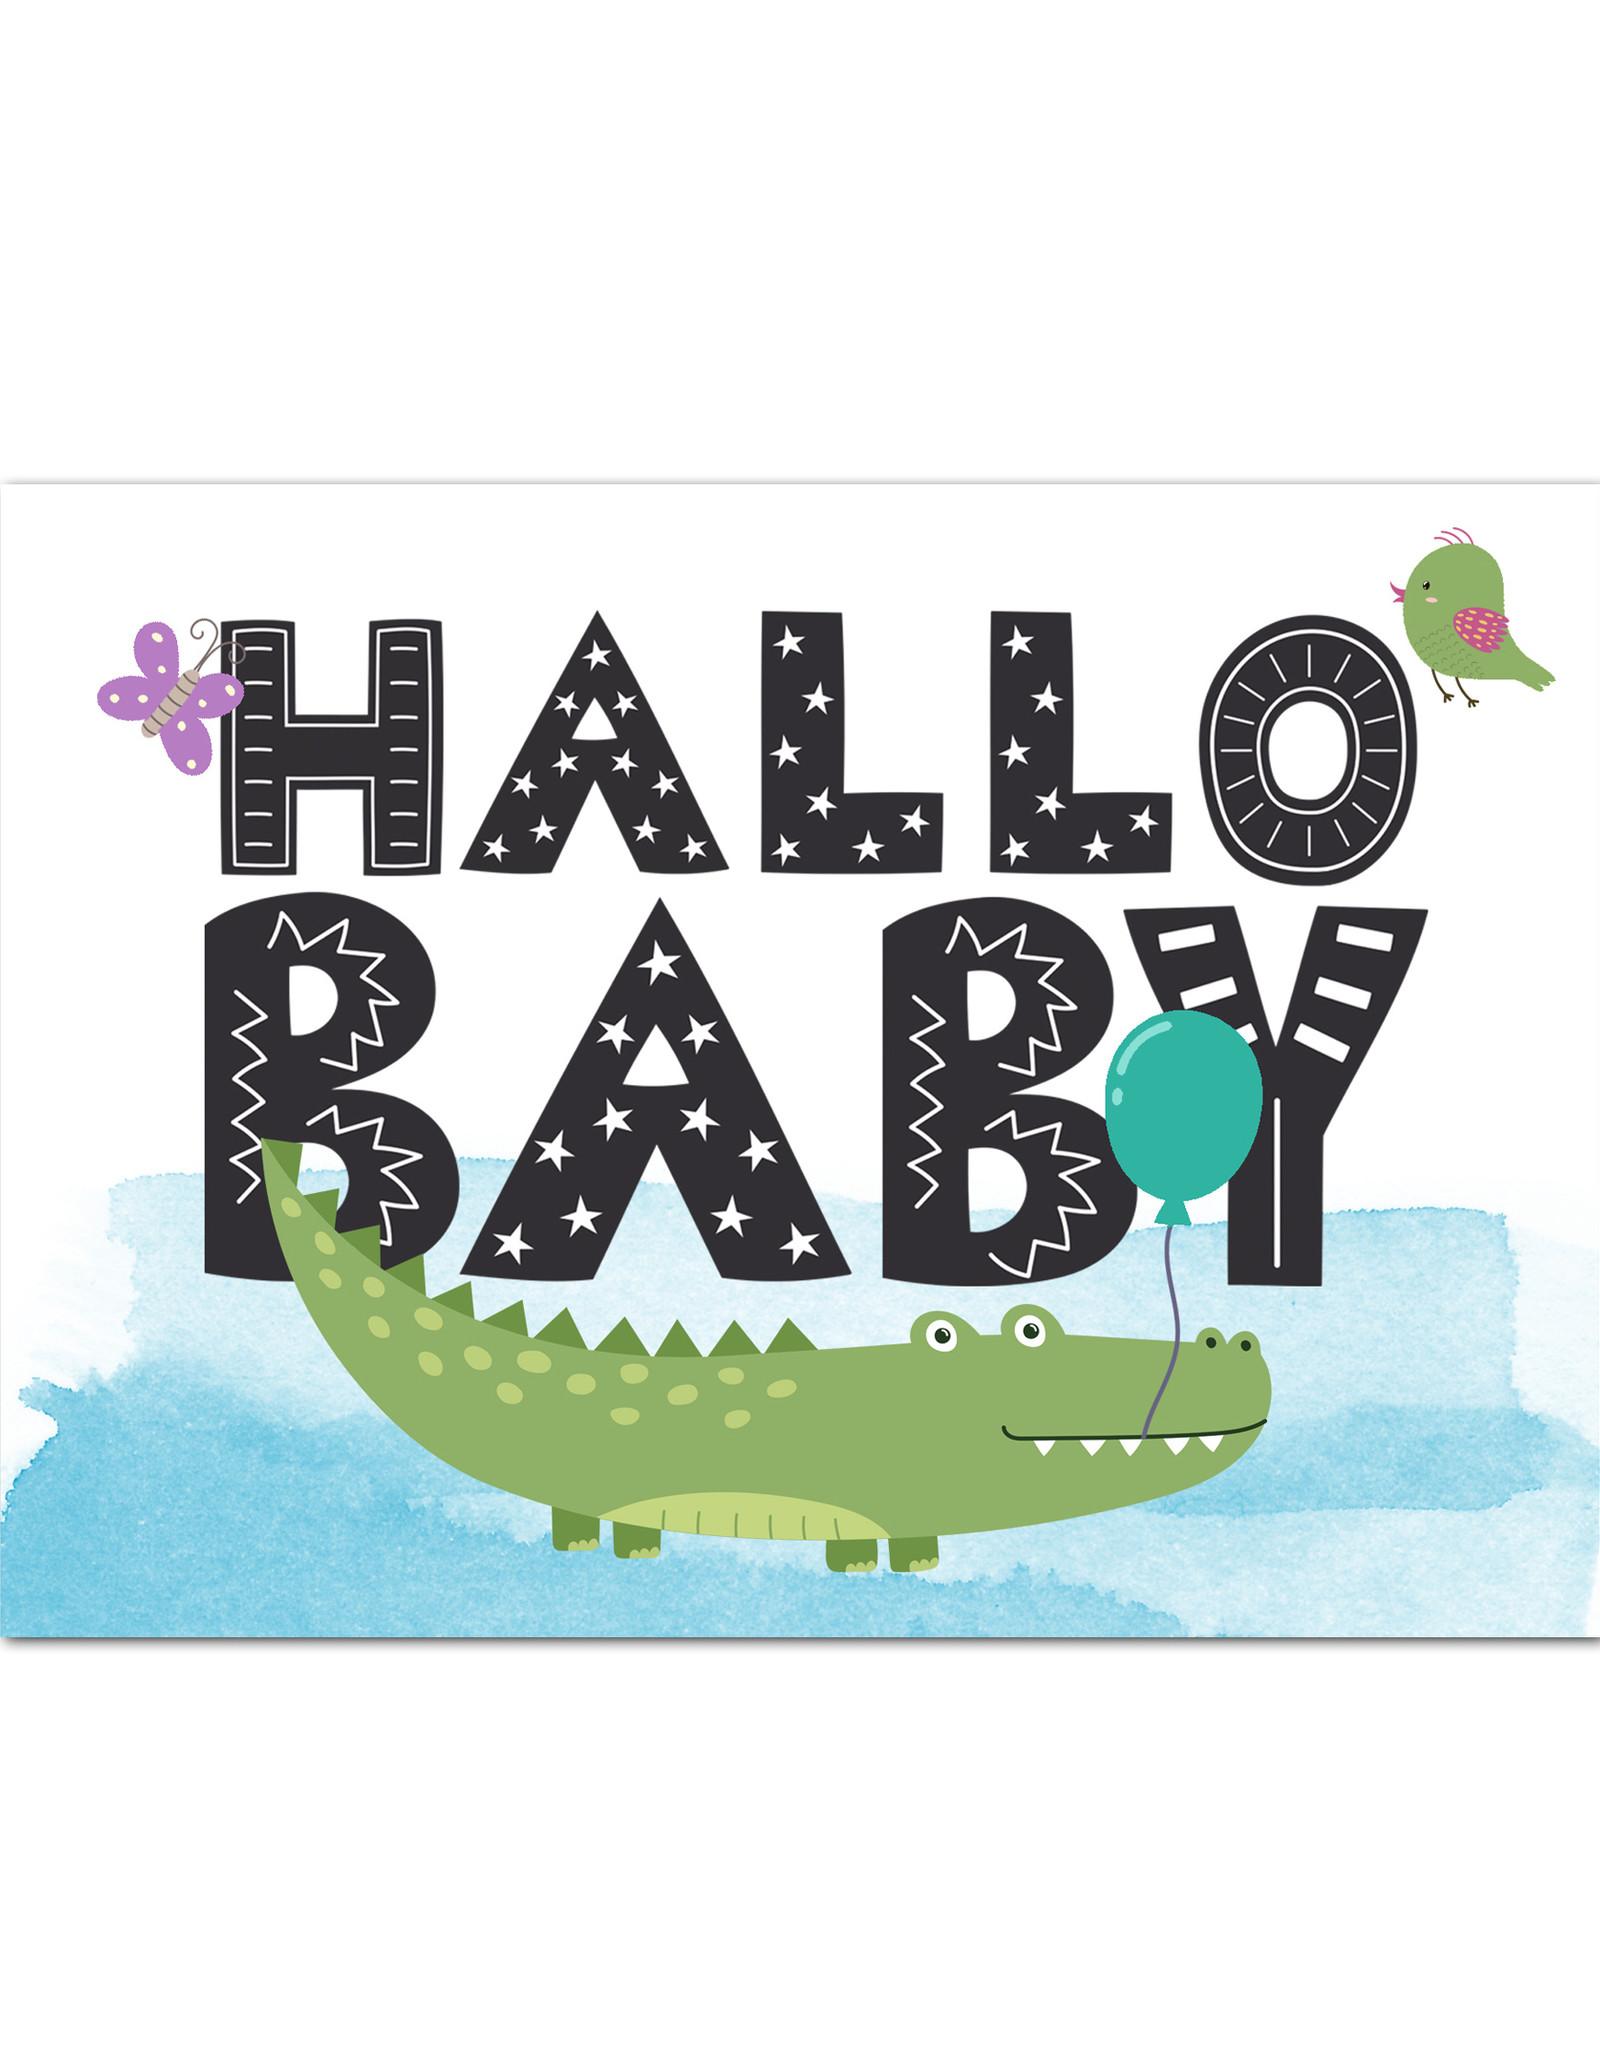 "Postkarte Baby ""Hallo Baby Jungen"", Baby Geschenk, Geschenk zur Geburt, Geschenk Geburt, Karte Geburt, Pullerparty, Postkarten Geburt"